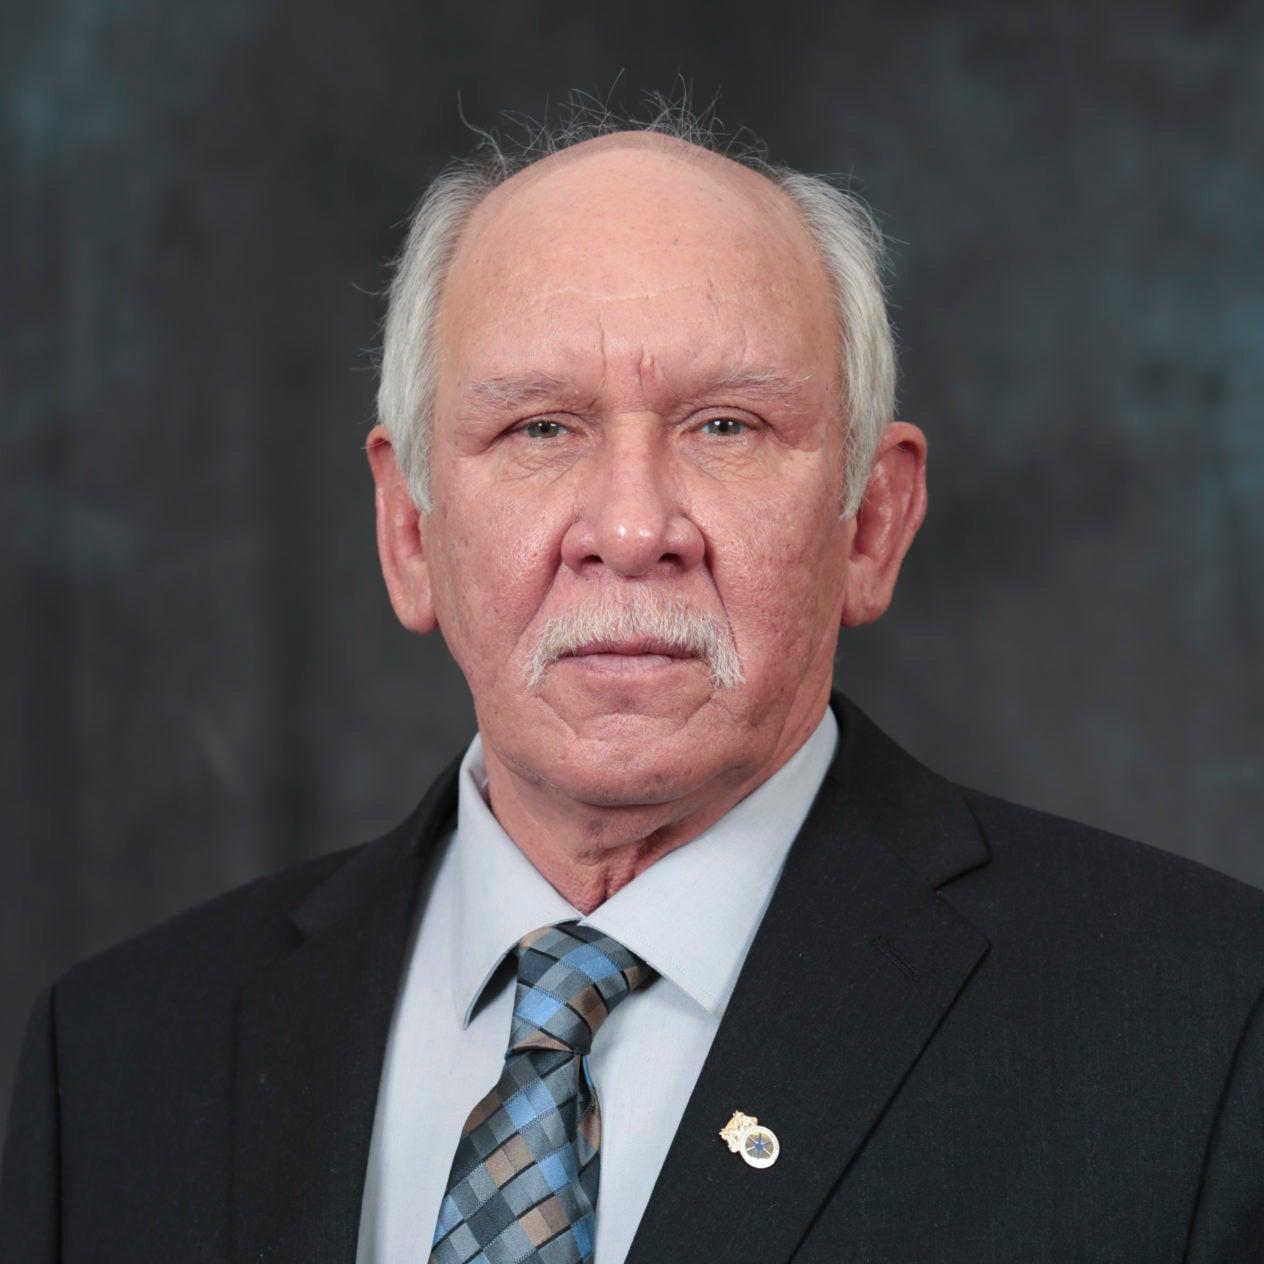 Kopystynsky